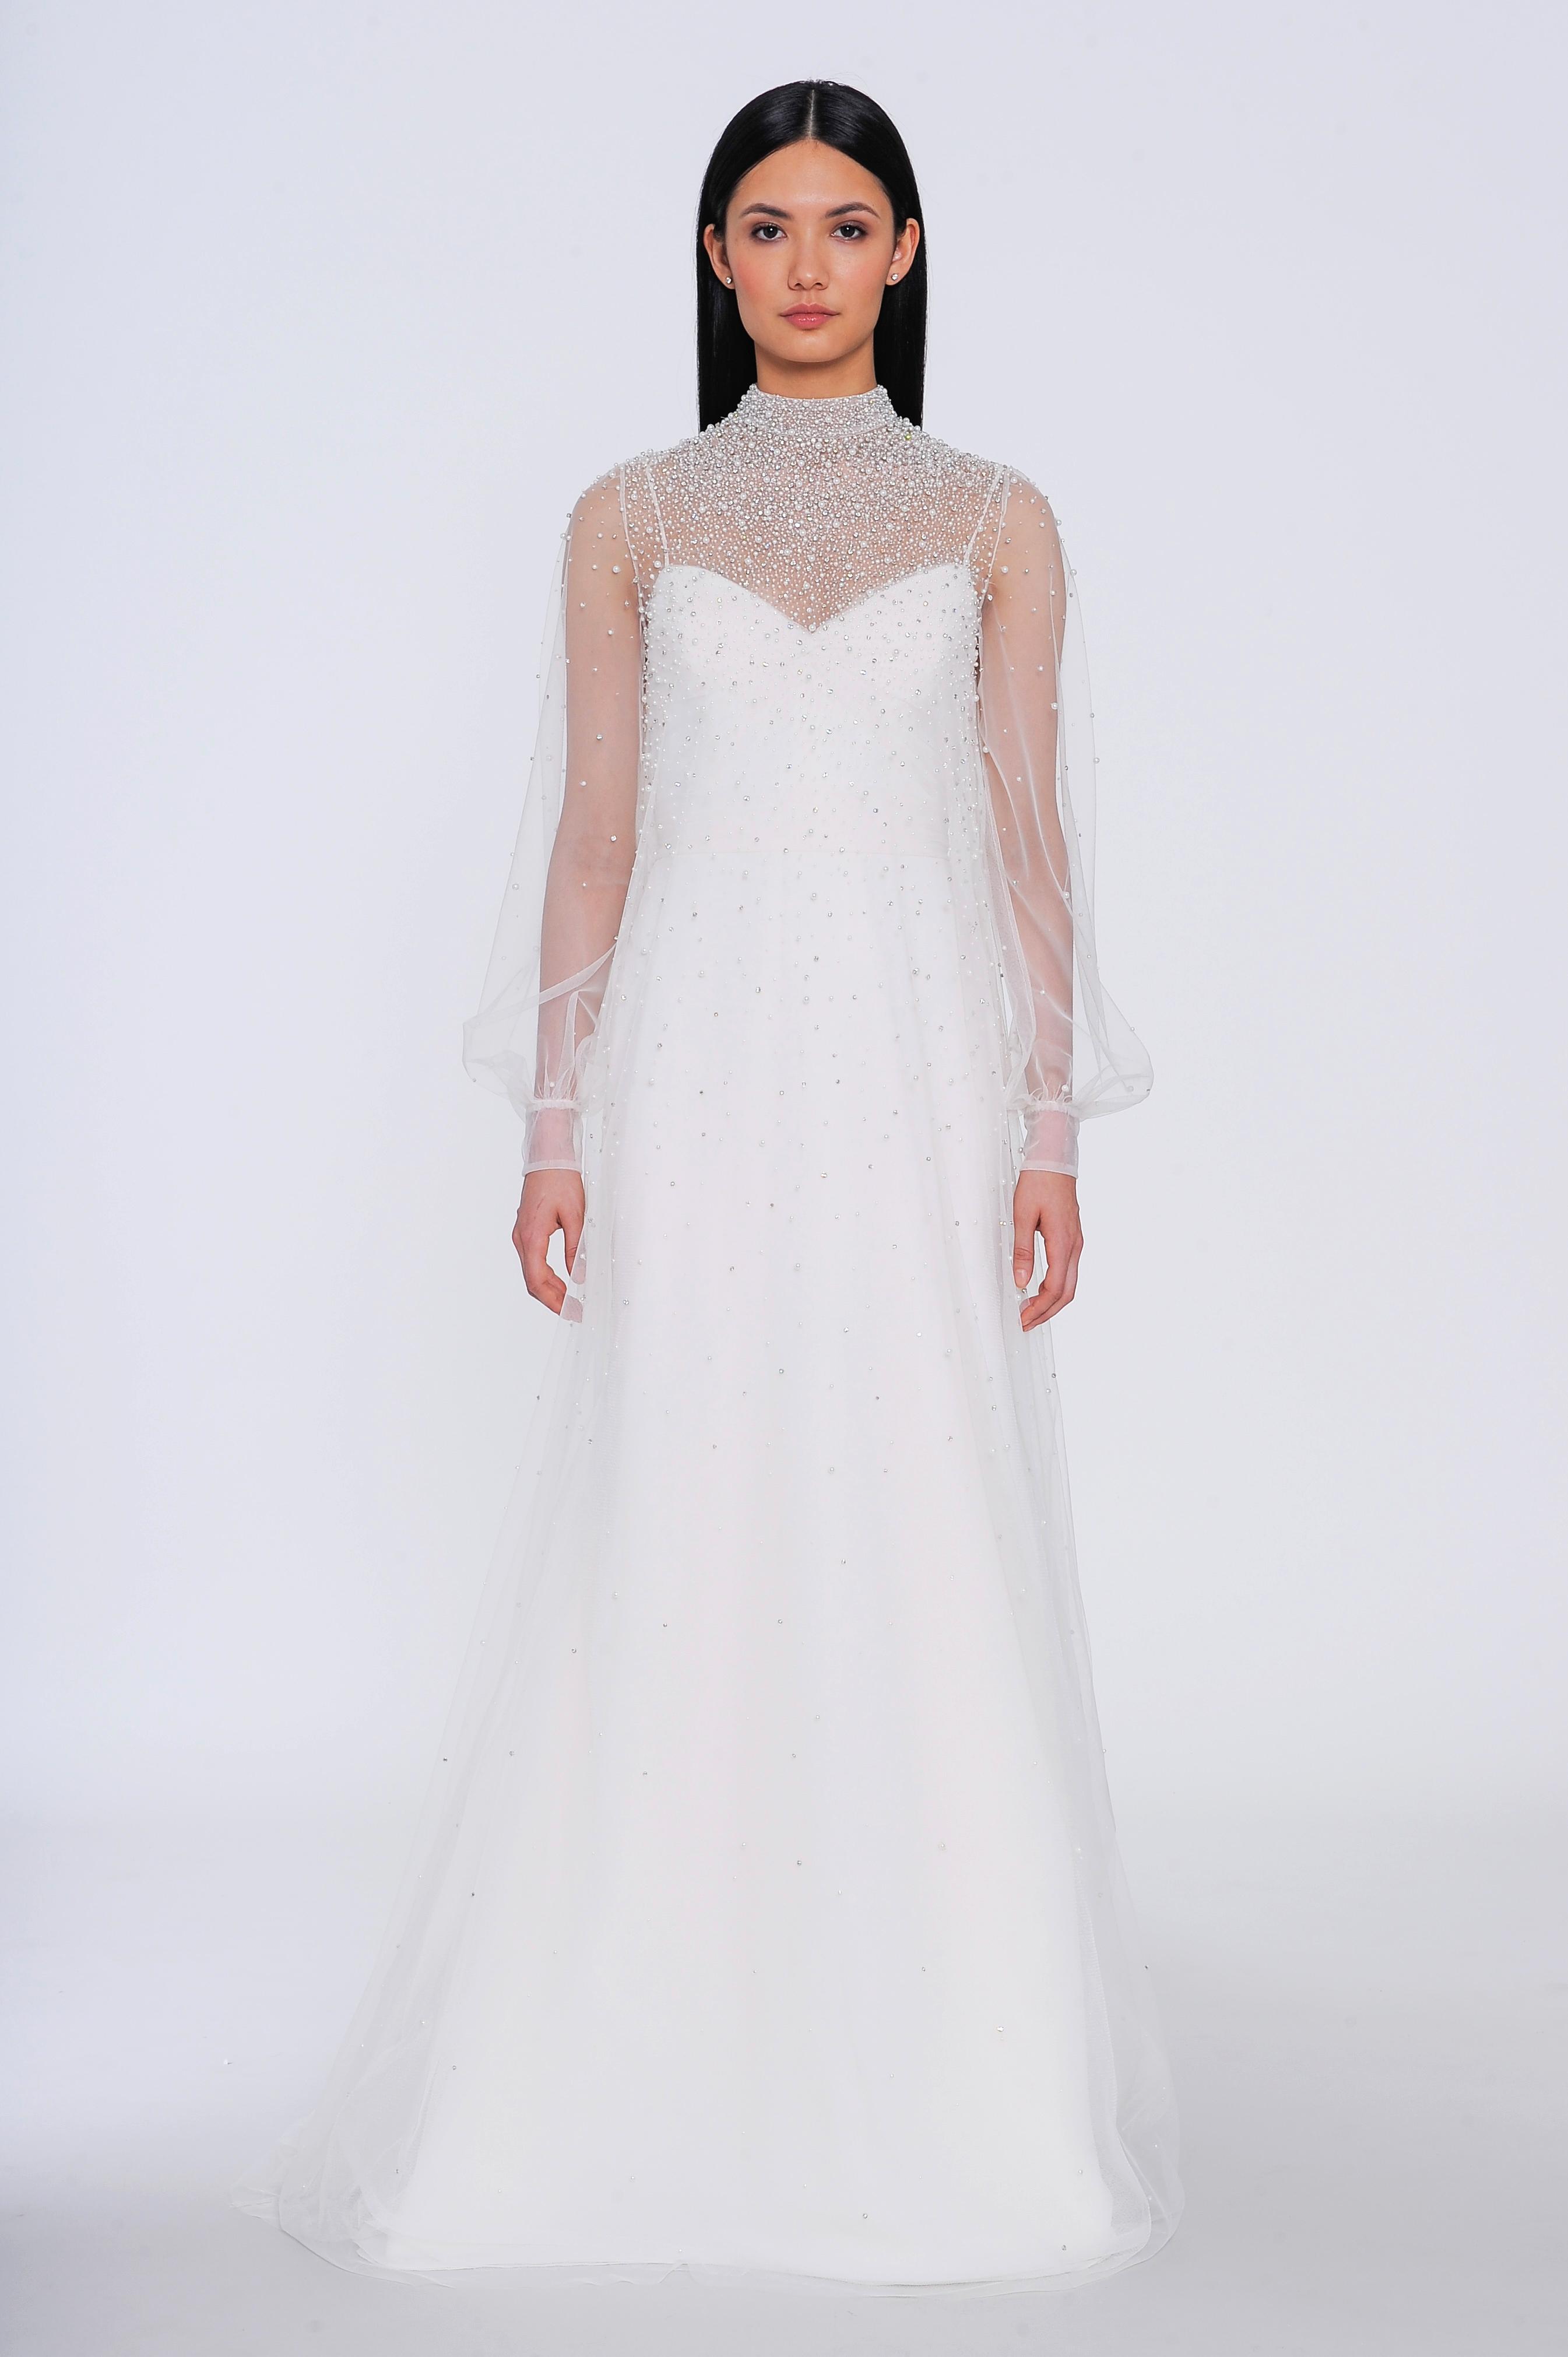 allison webb wedding dress spring 2019 long sleeve illusion